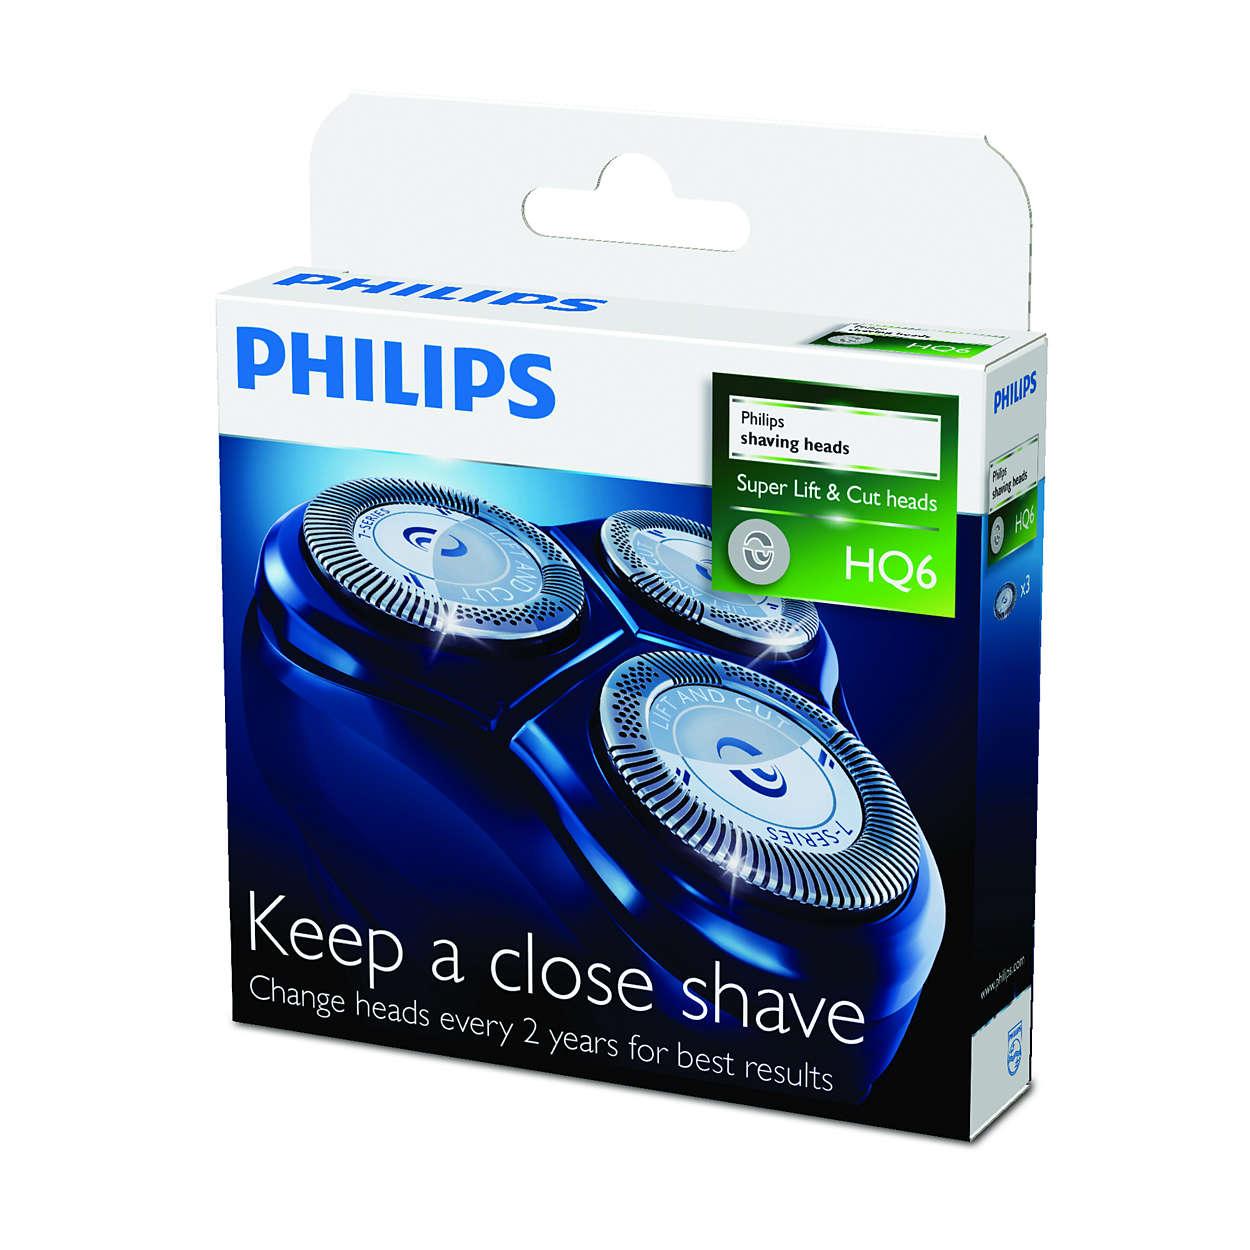 Philips Scheerkop (HQ6/50 Quadra Action) HQ6/50